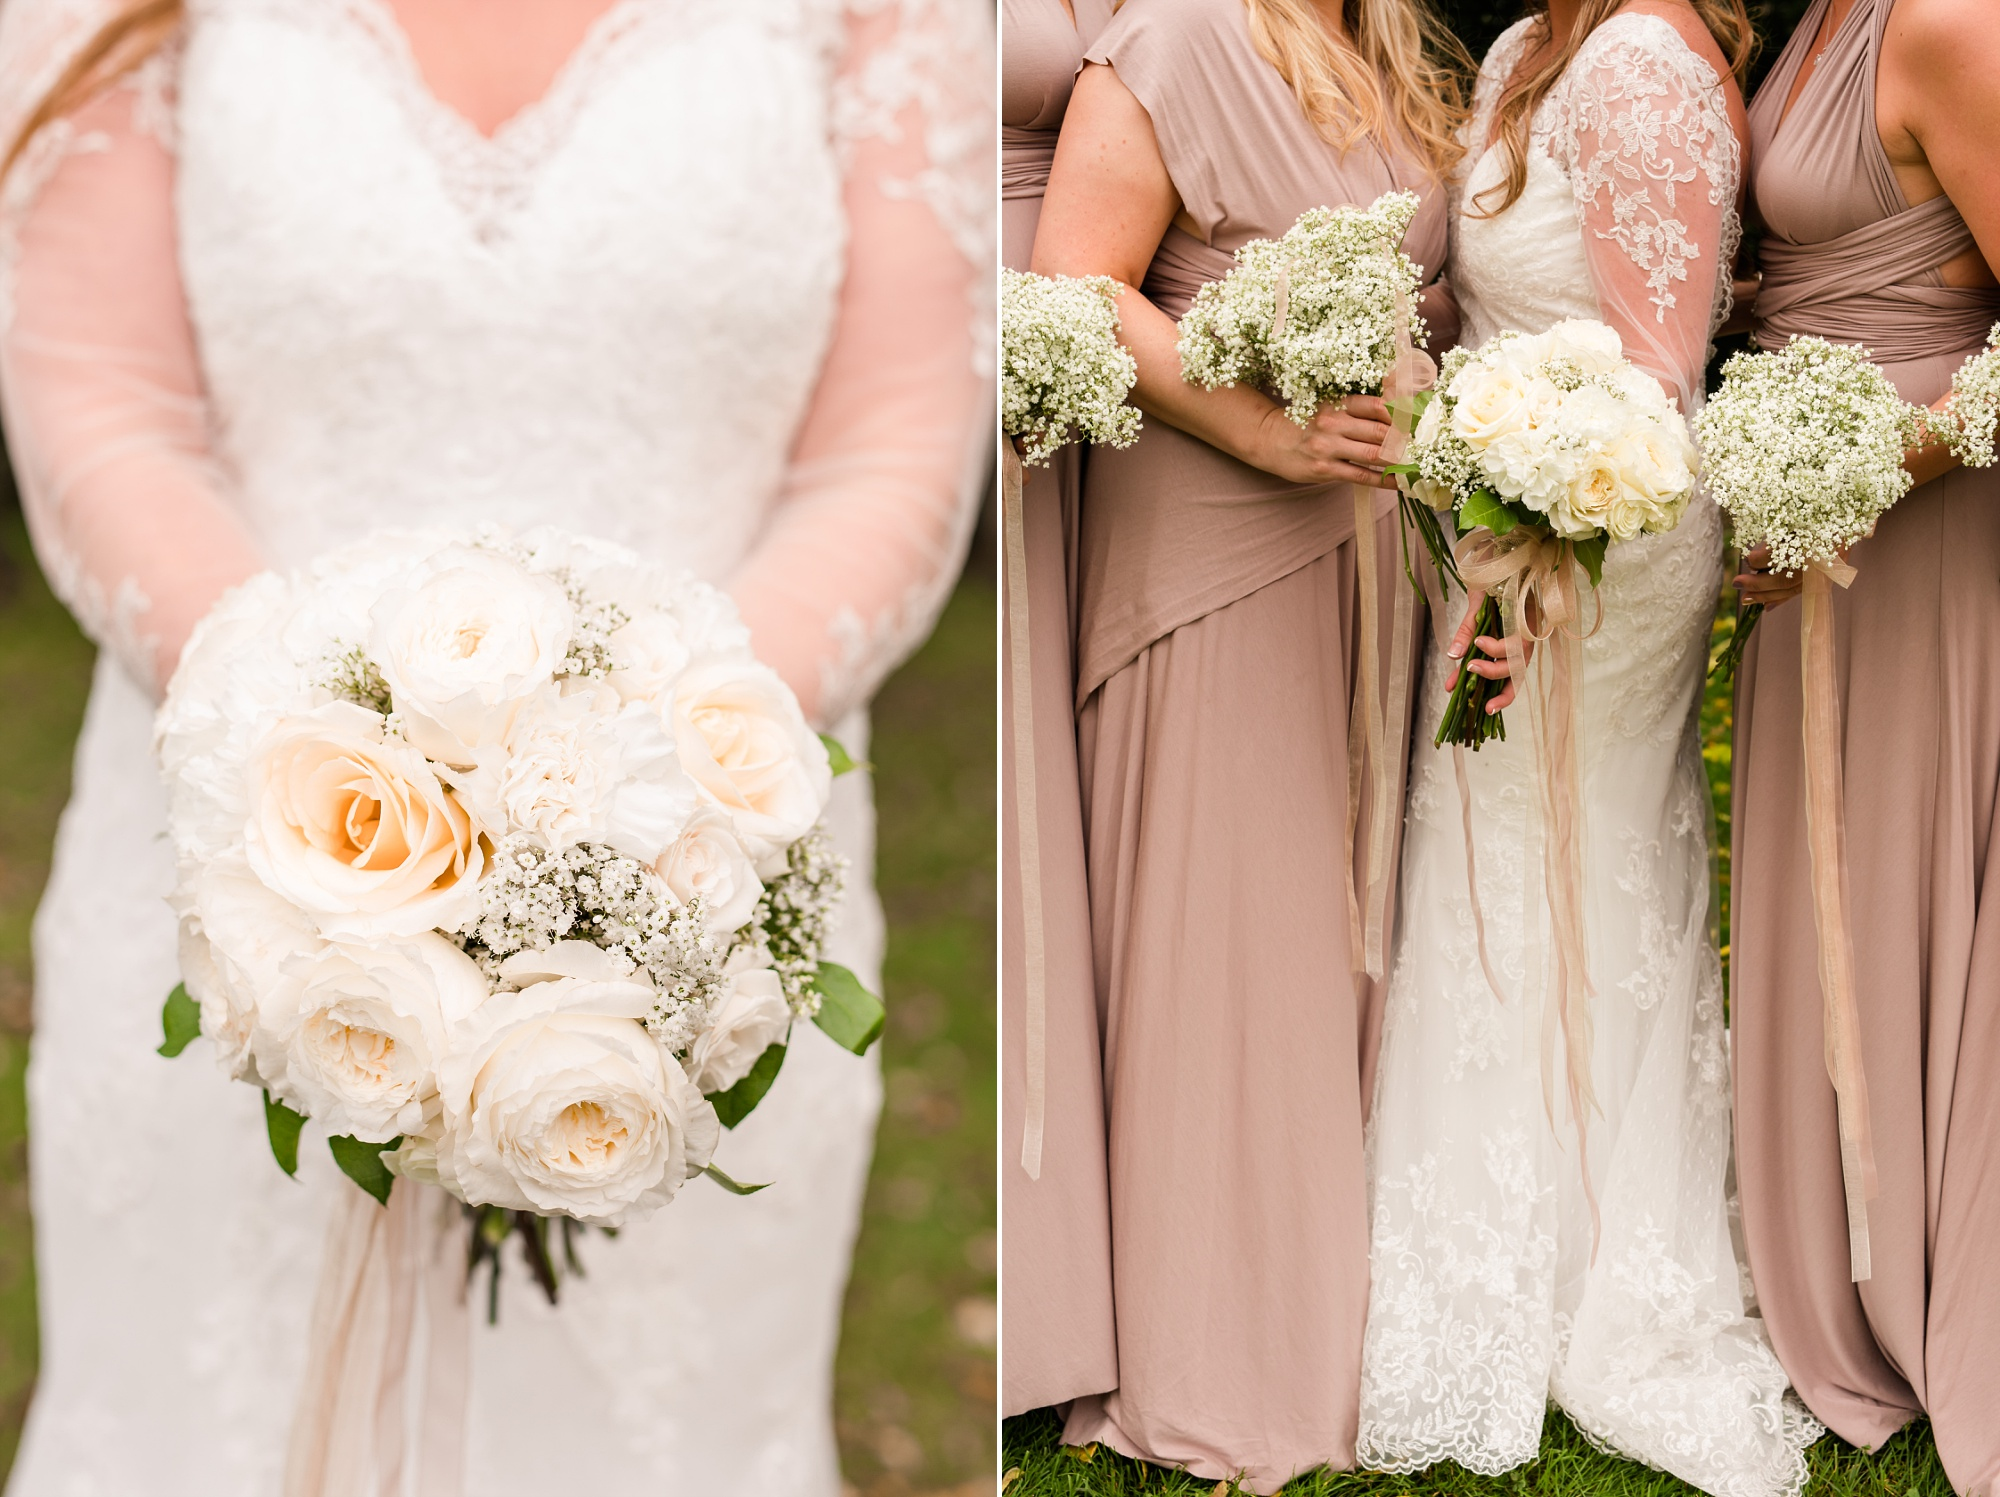 AmberLangerudPhotography_Fair Hills Resort Lakeside Wedding in Minnesota_3456.jpg